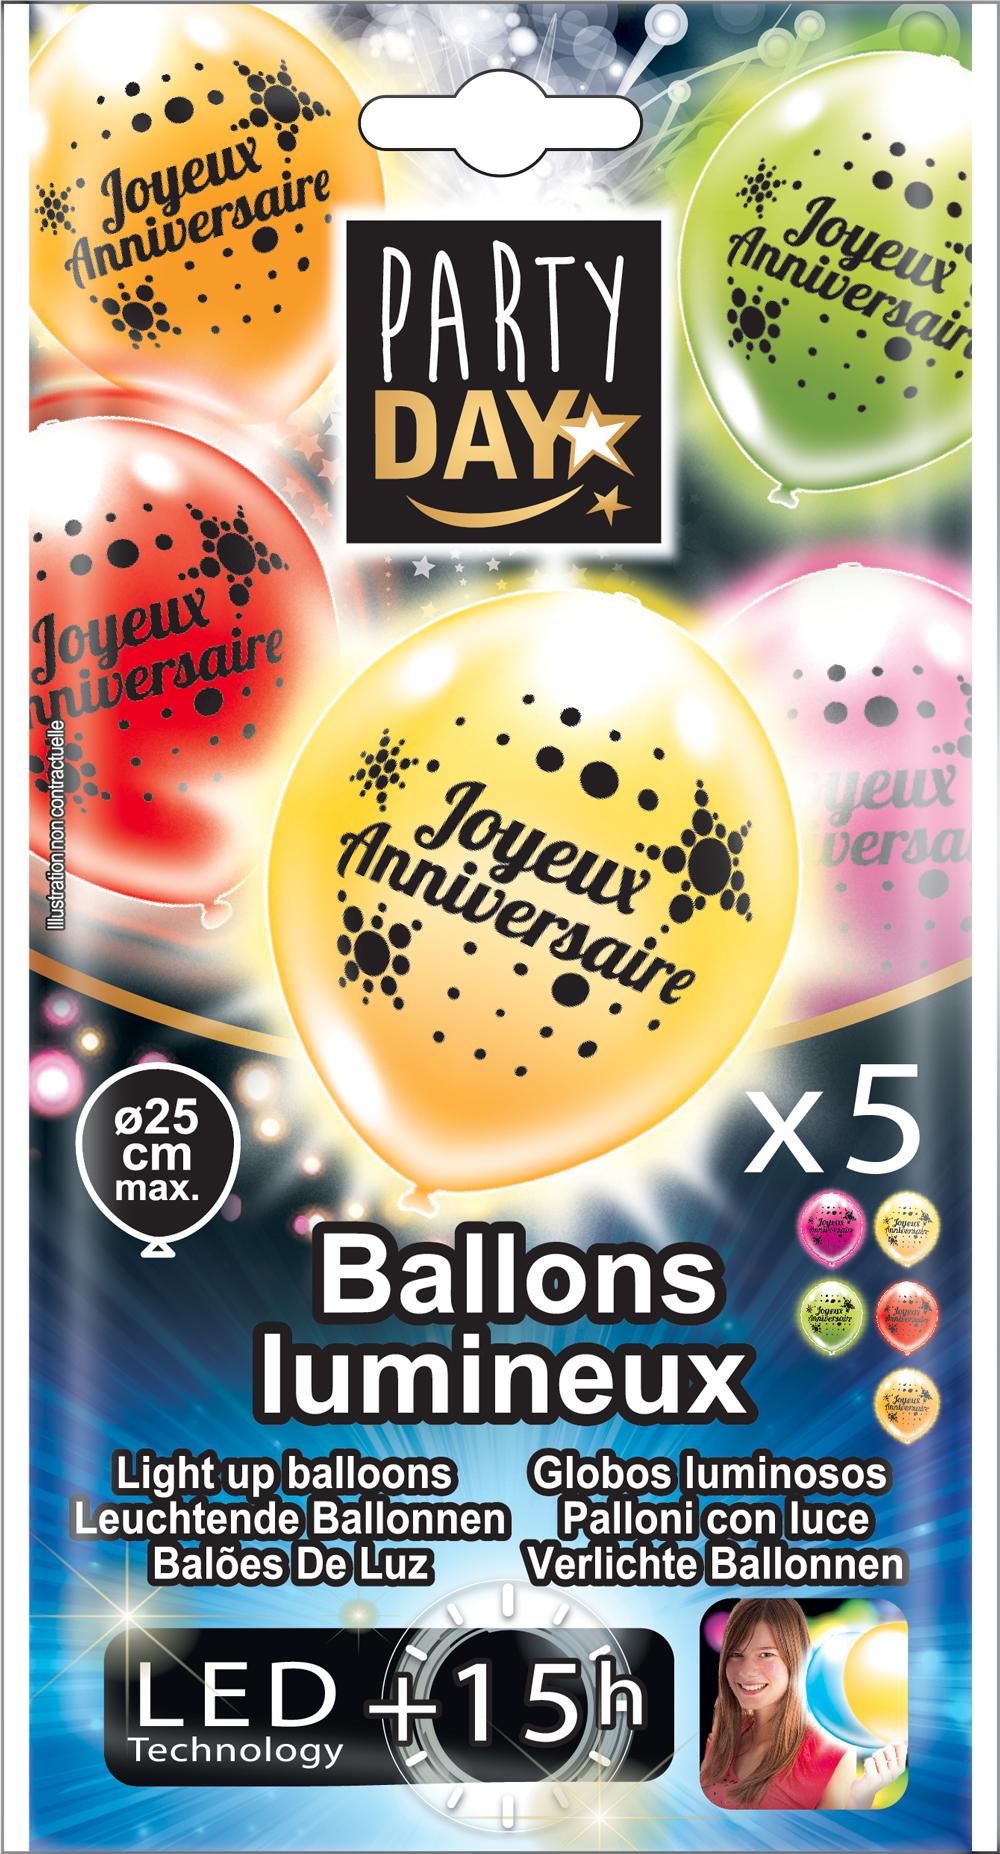 P155959-BALLONS-LED-JOYEUX-ANNIVERSAIRE-02_2018-V2